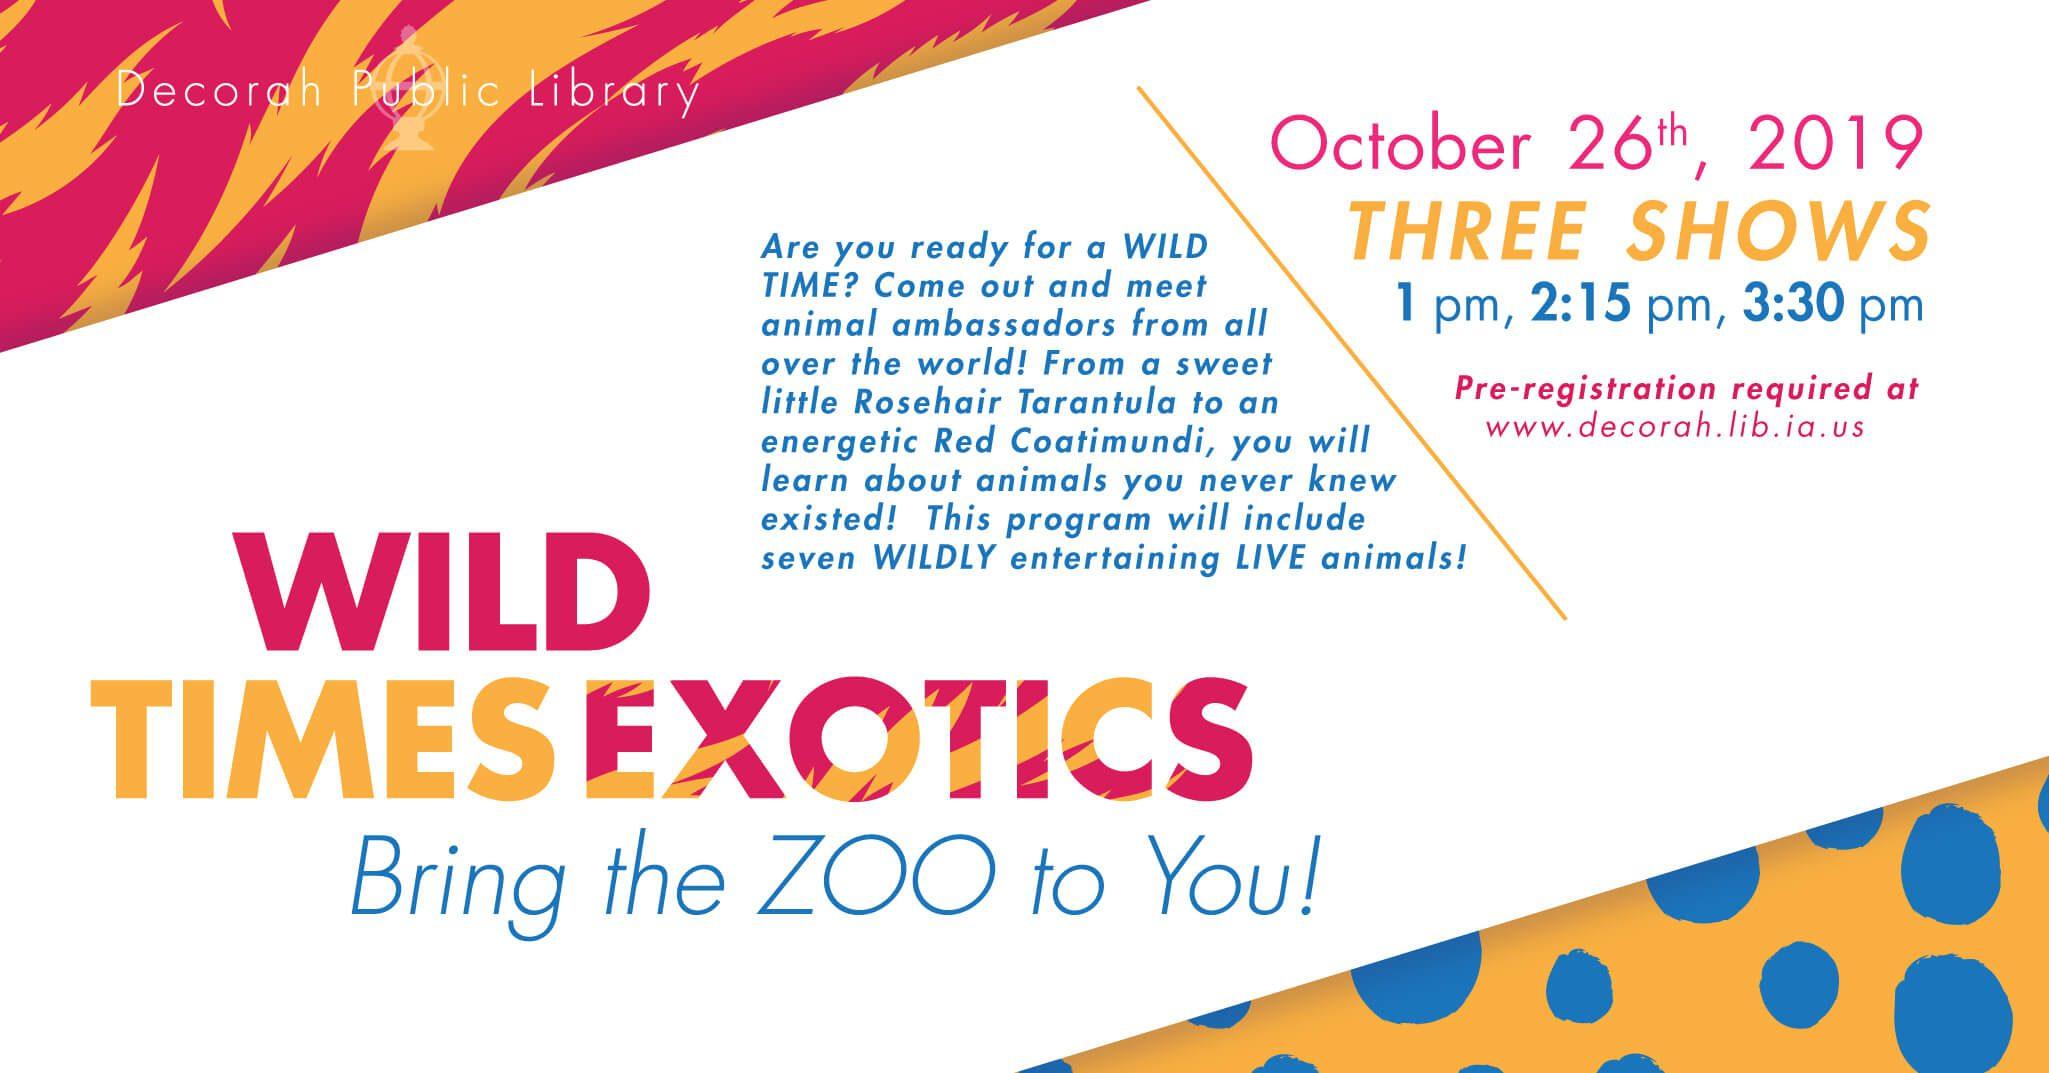 Wild Times Exotics Oct 26th